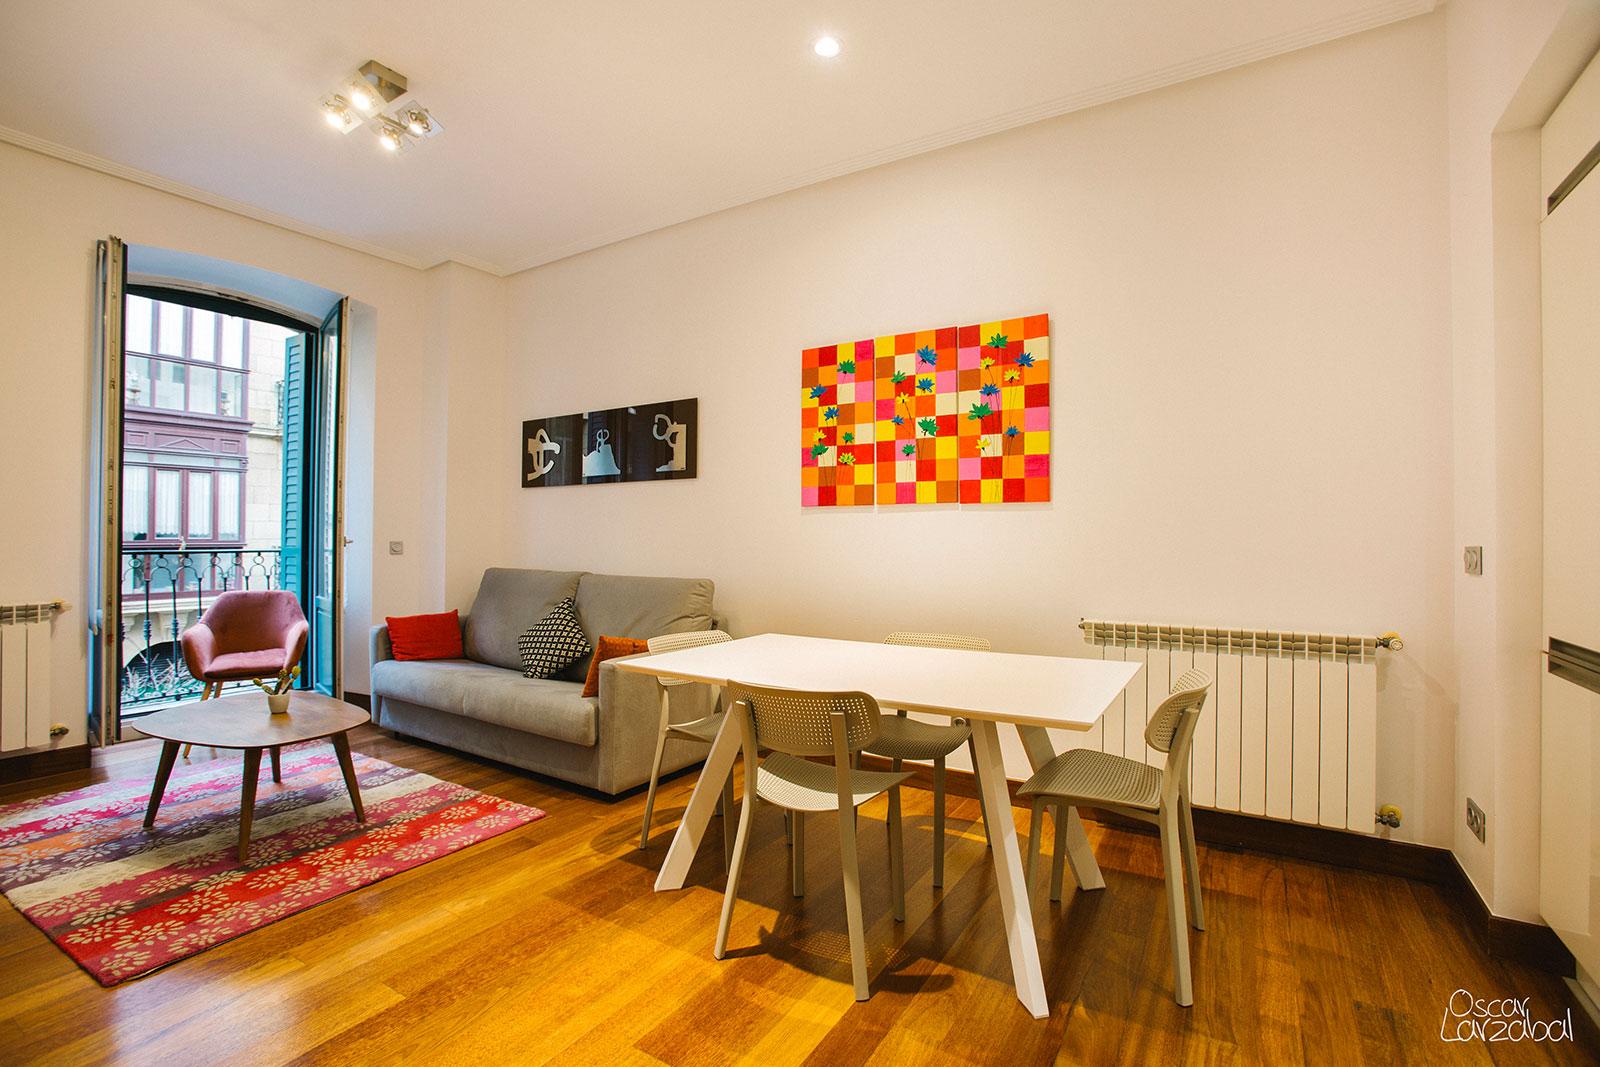 Fotografo interiorismo en Donostia San Sebastian fotografia interior en Donosti